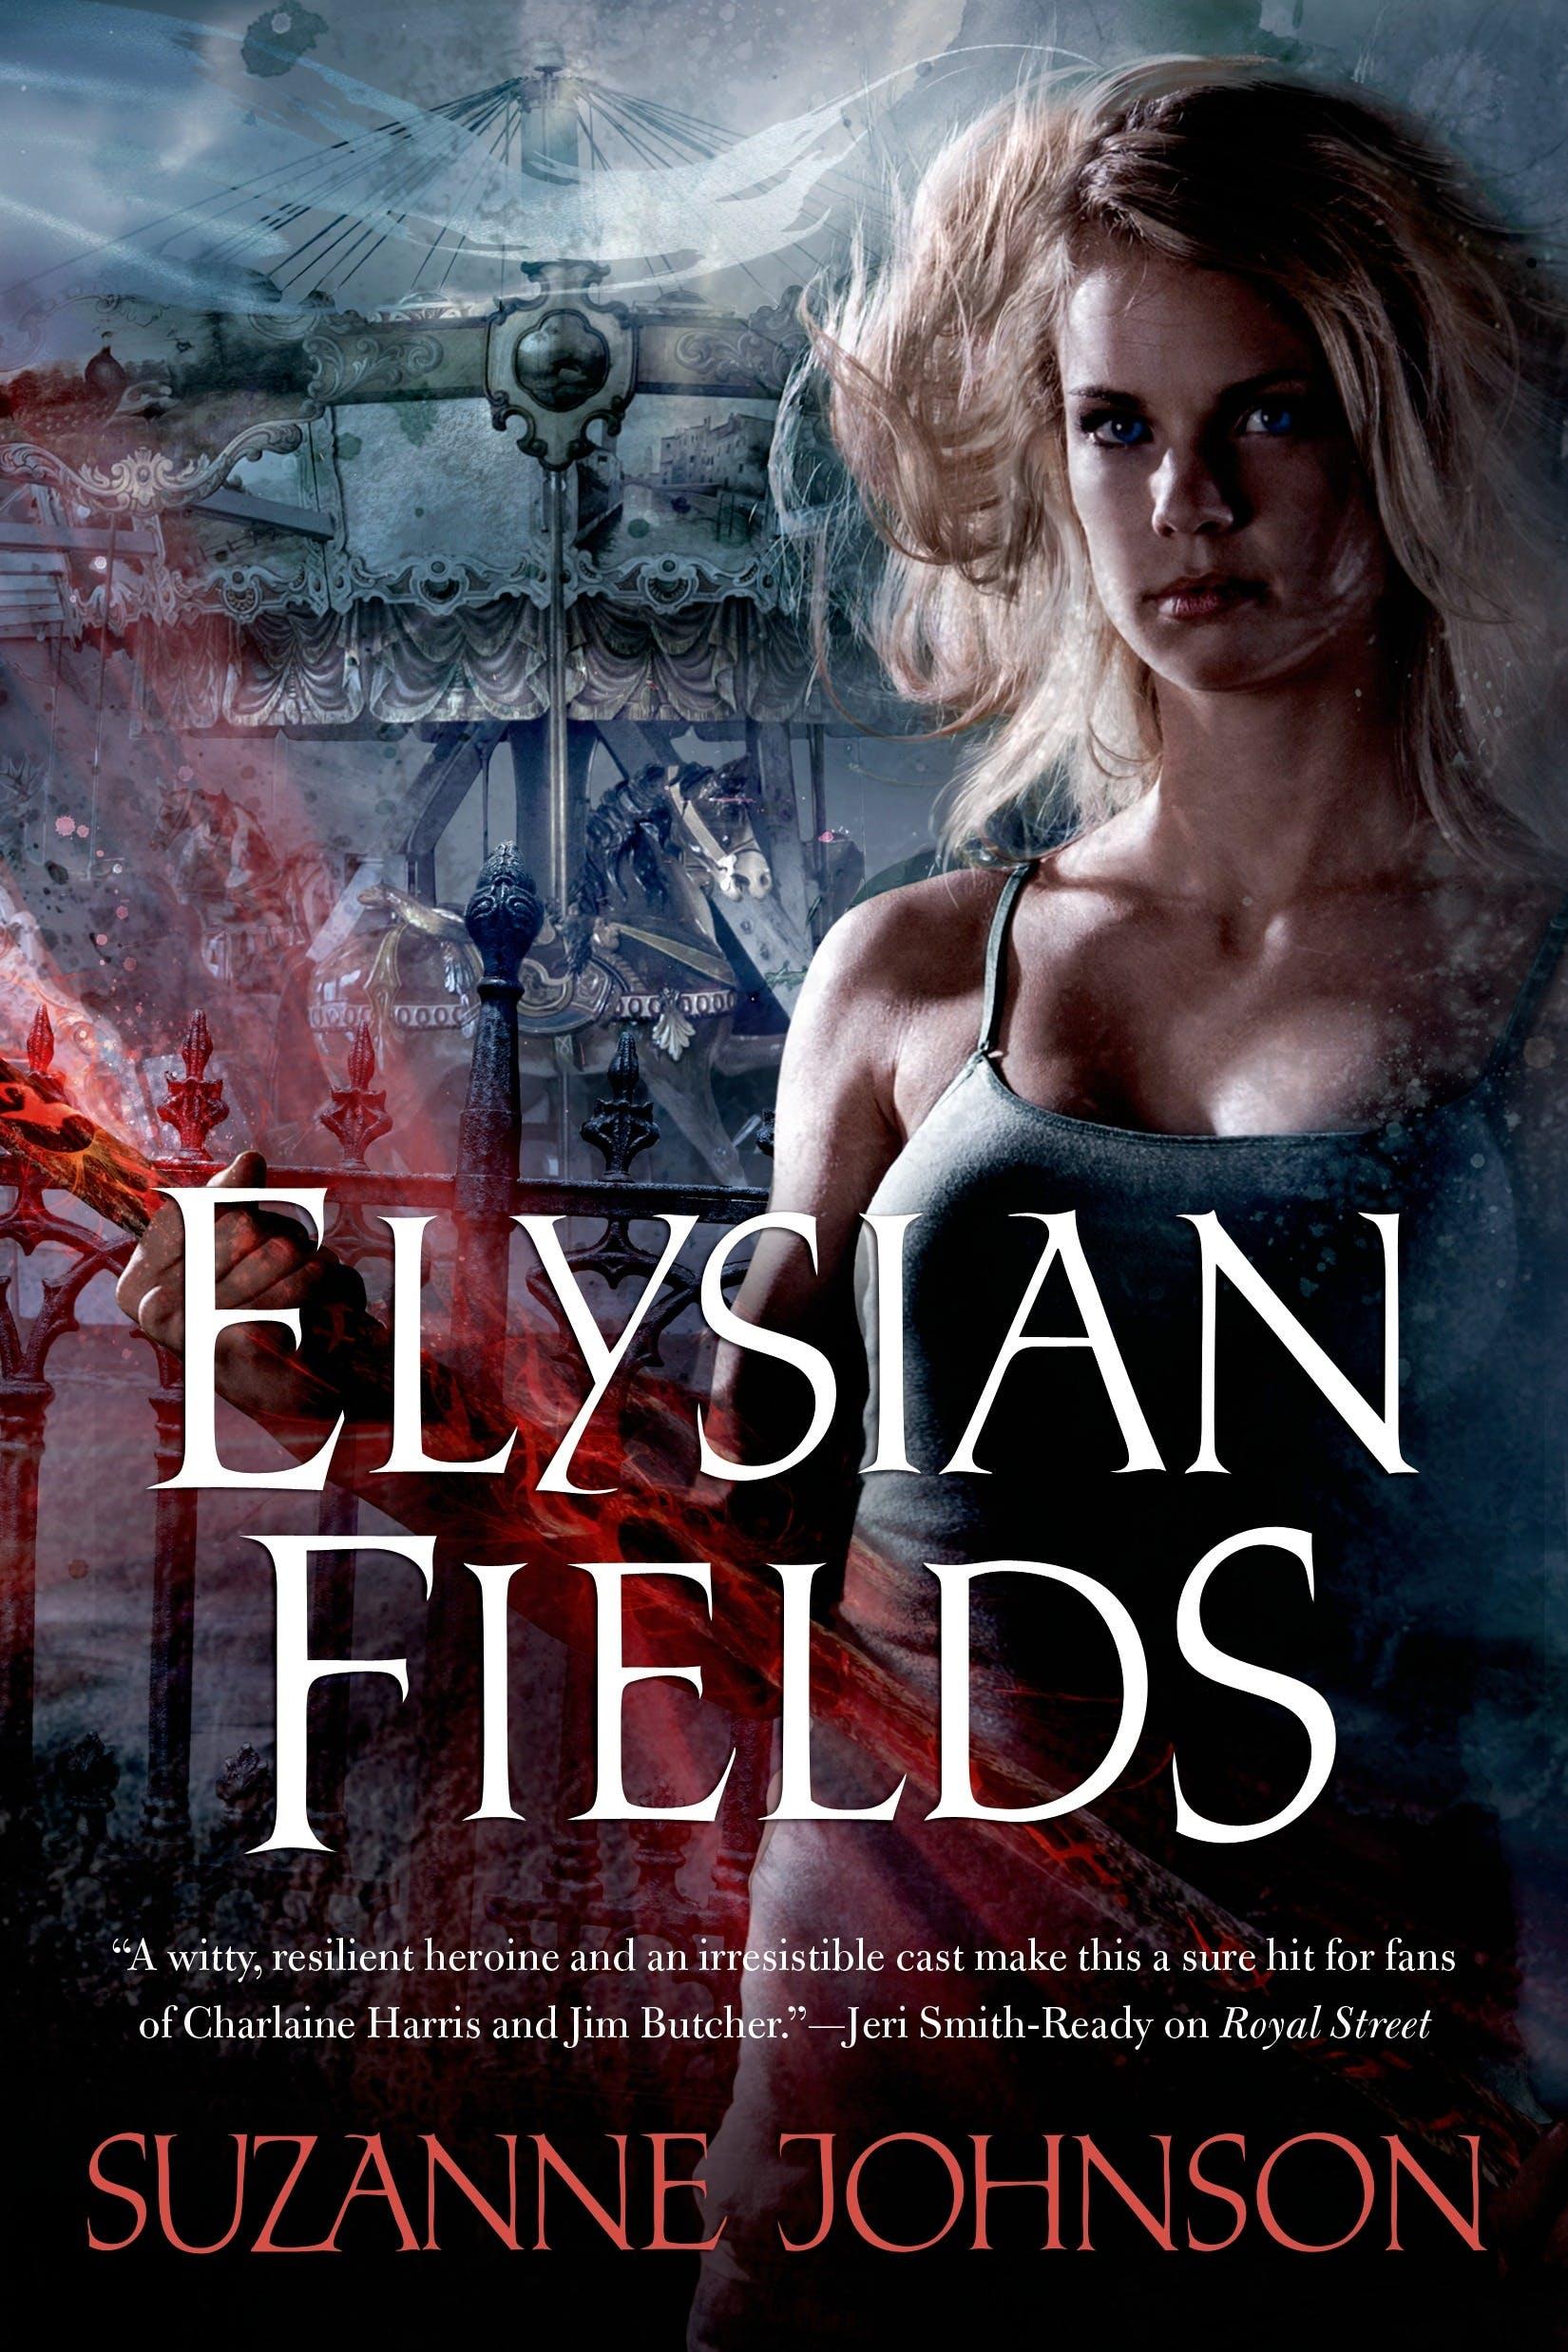 Image of Elysian Fields